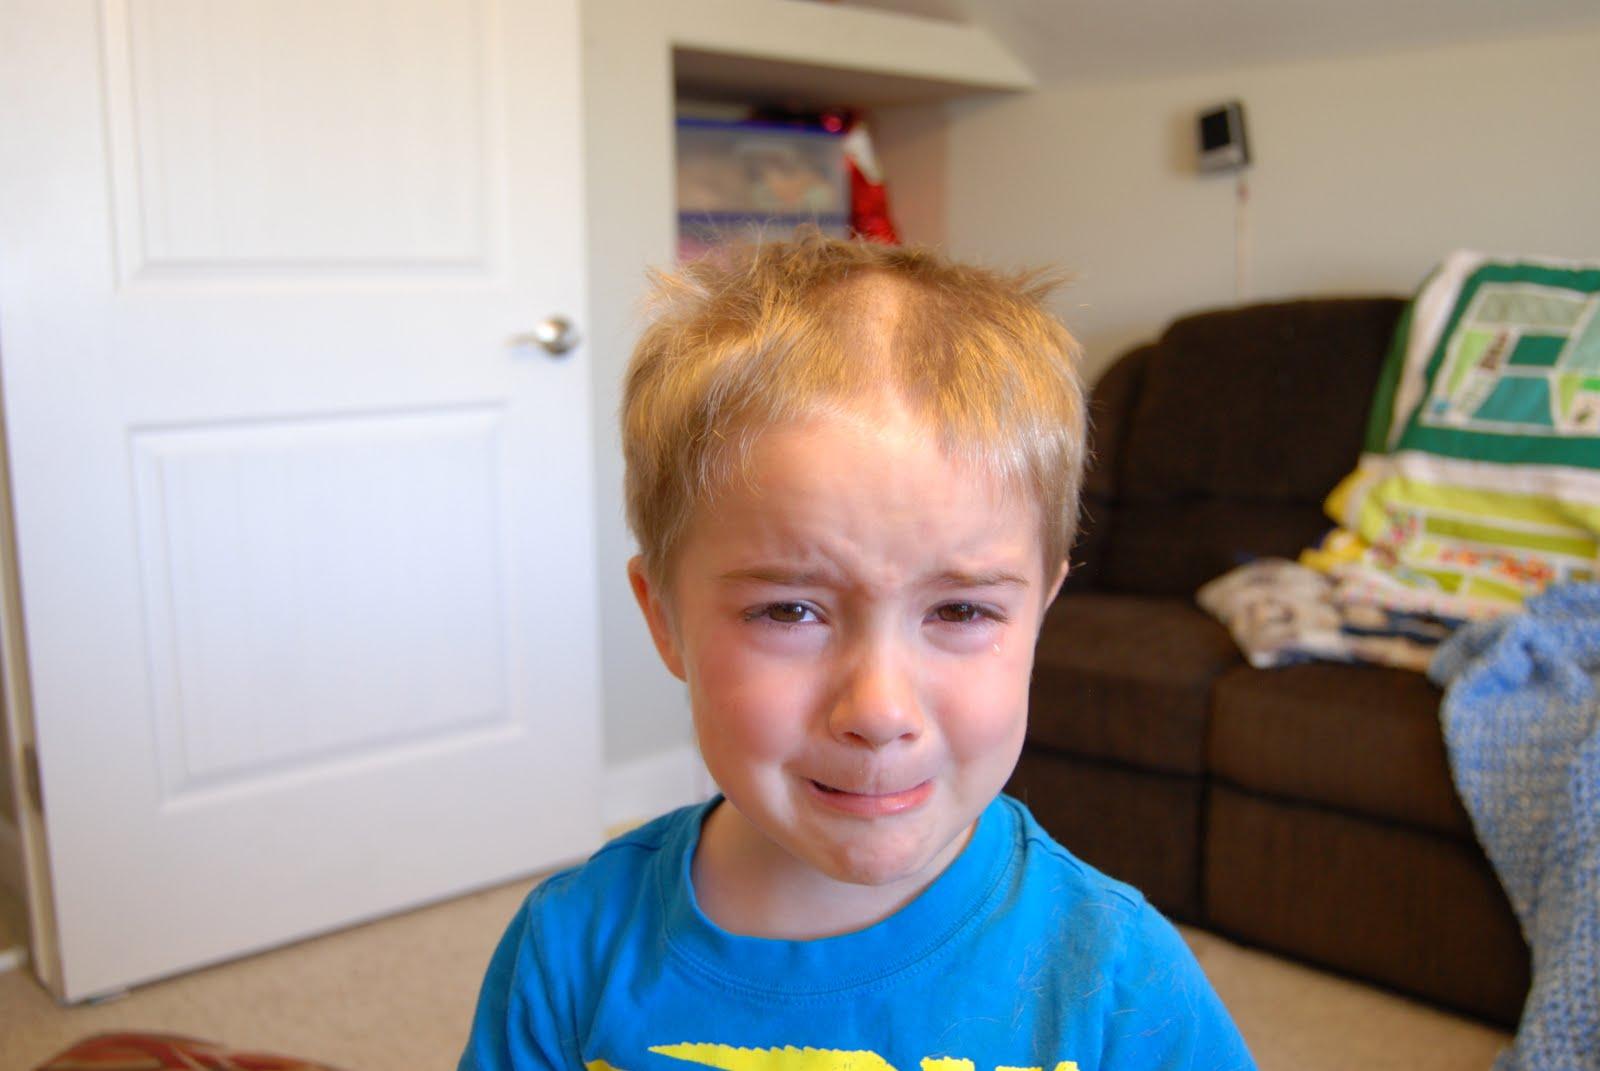 Children Who Have Cut Their Own Hair Badly